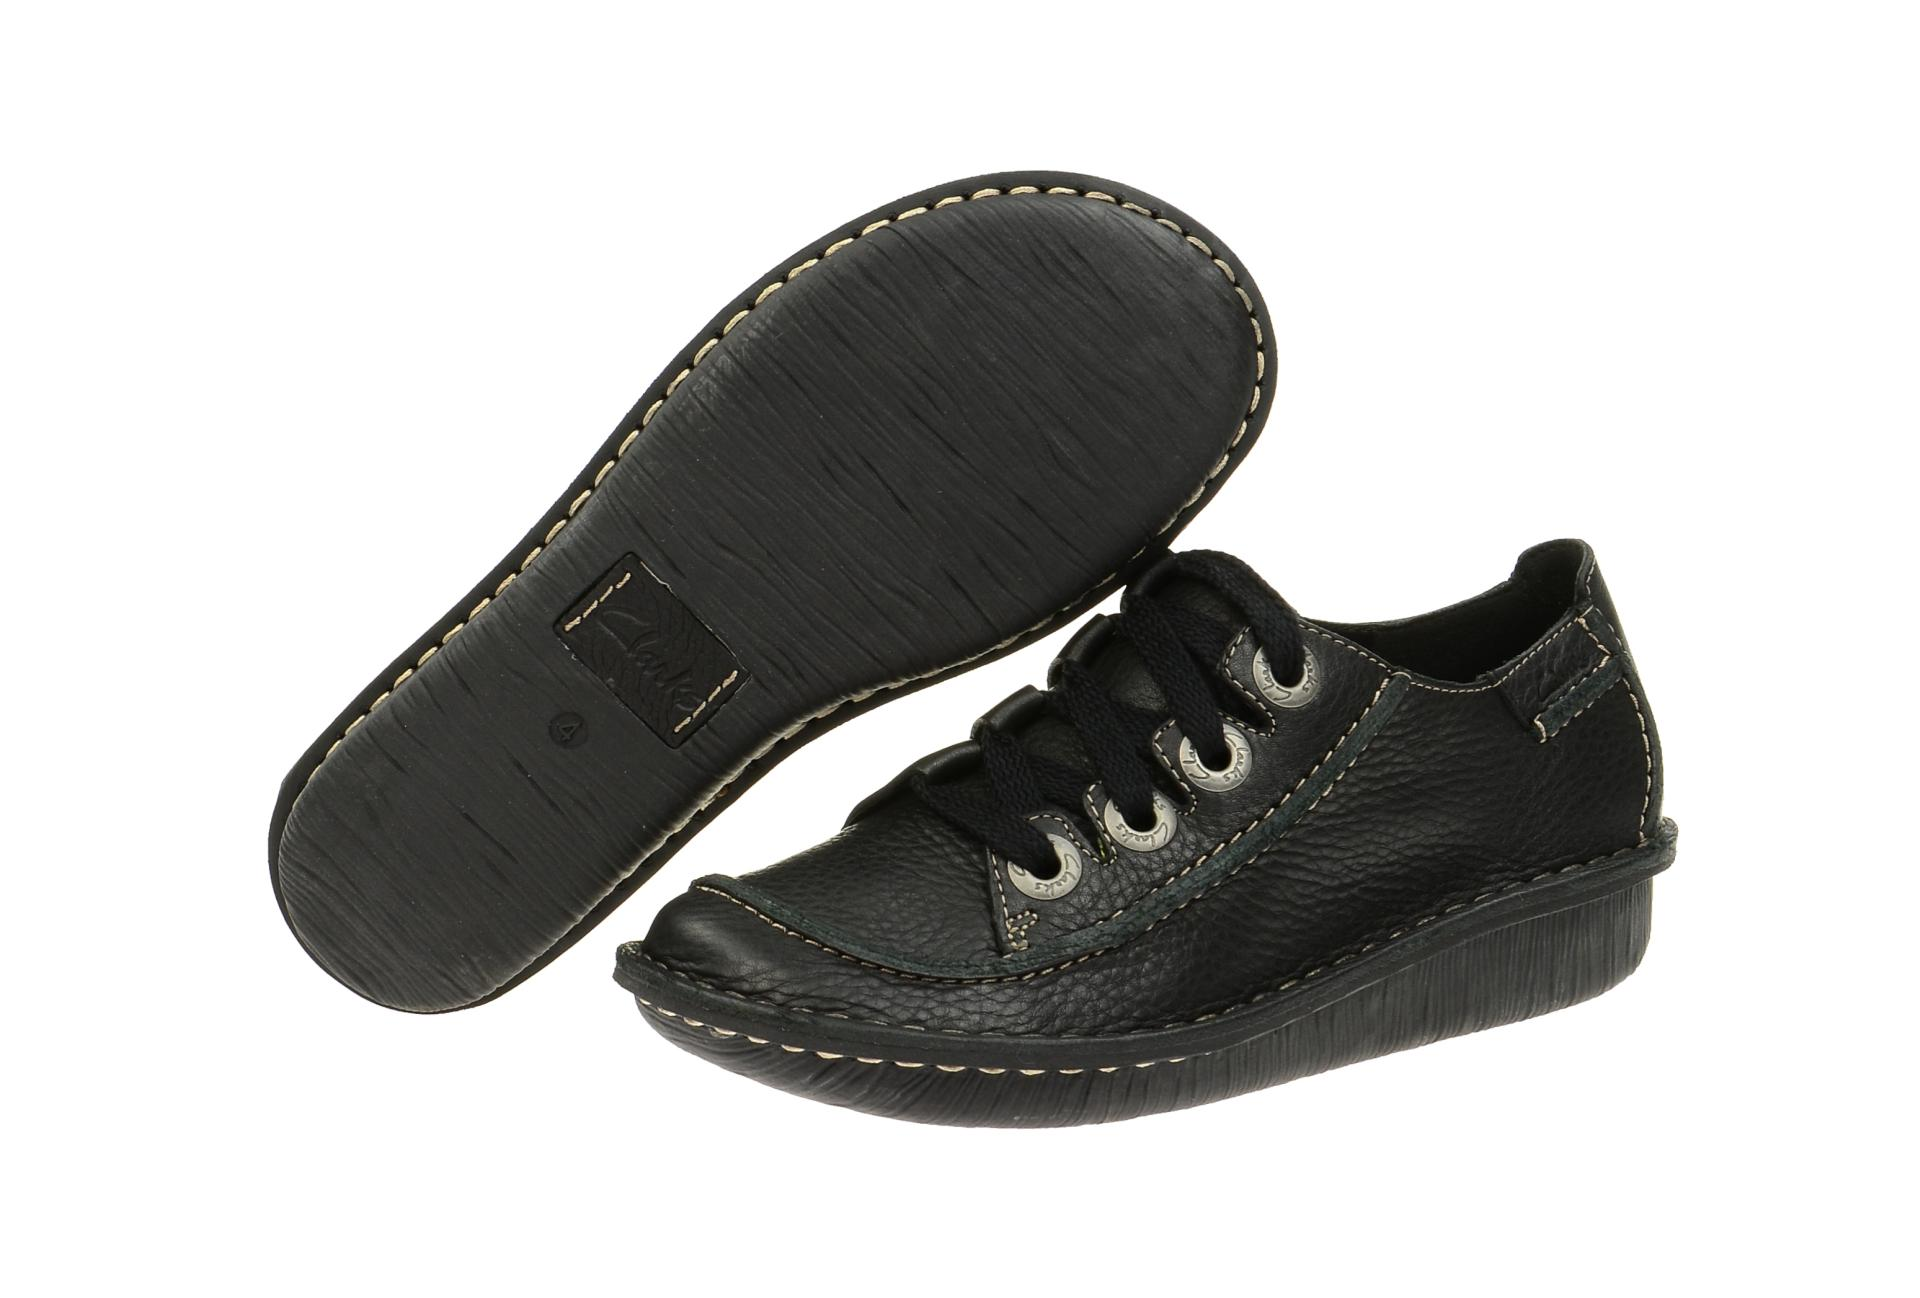 Clarks Schuhe Funny Story schwarz Damen Schnürer NEU | eBay